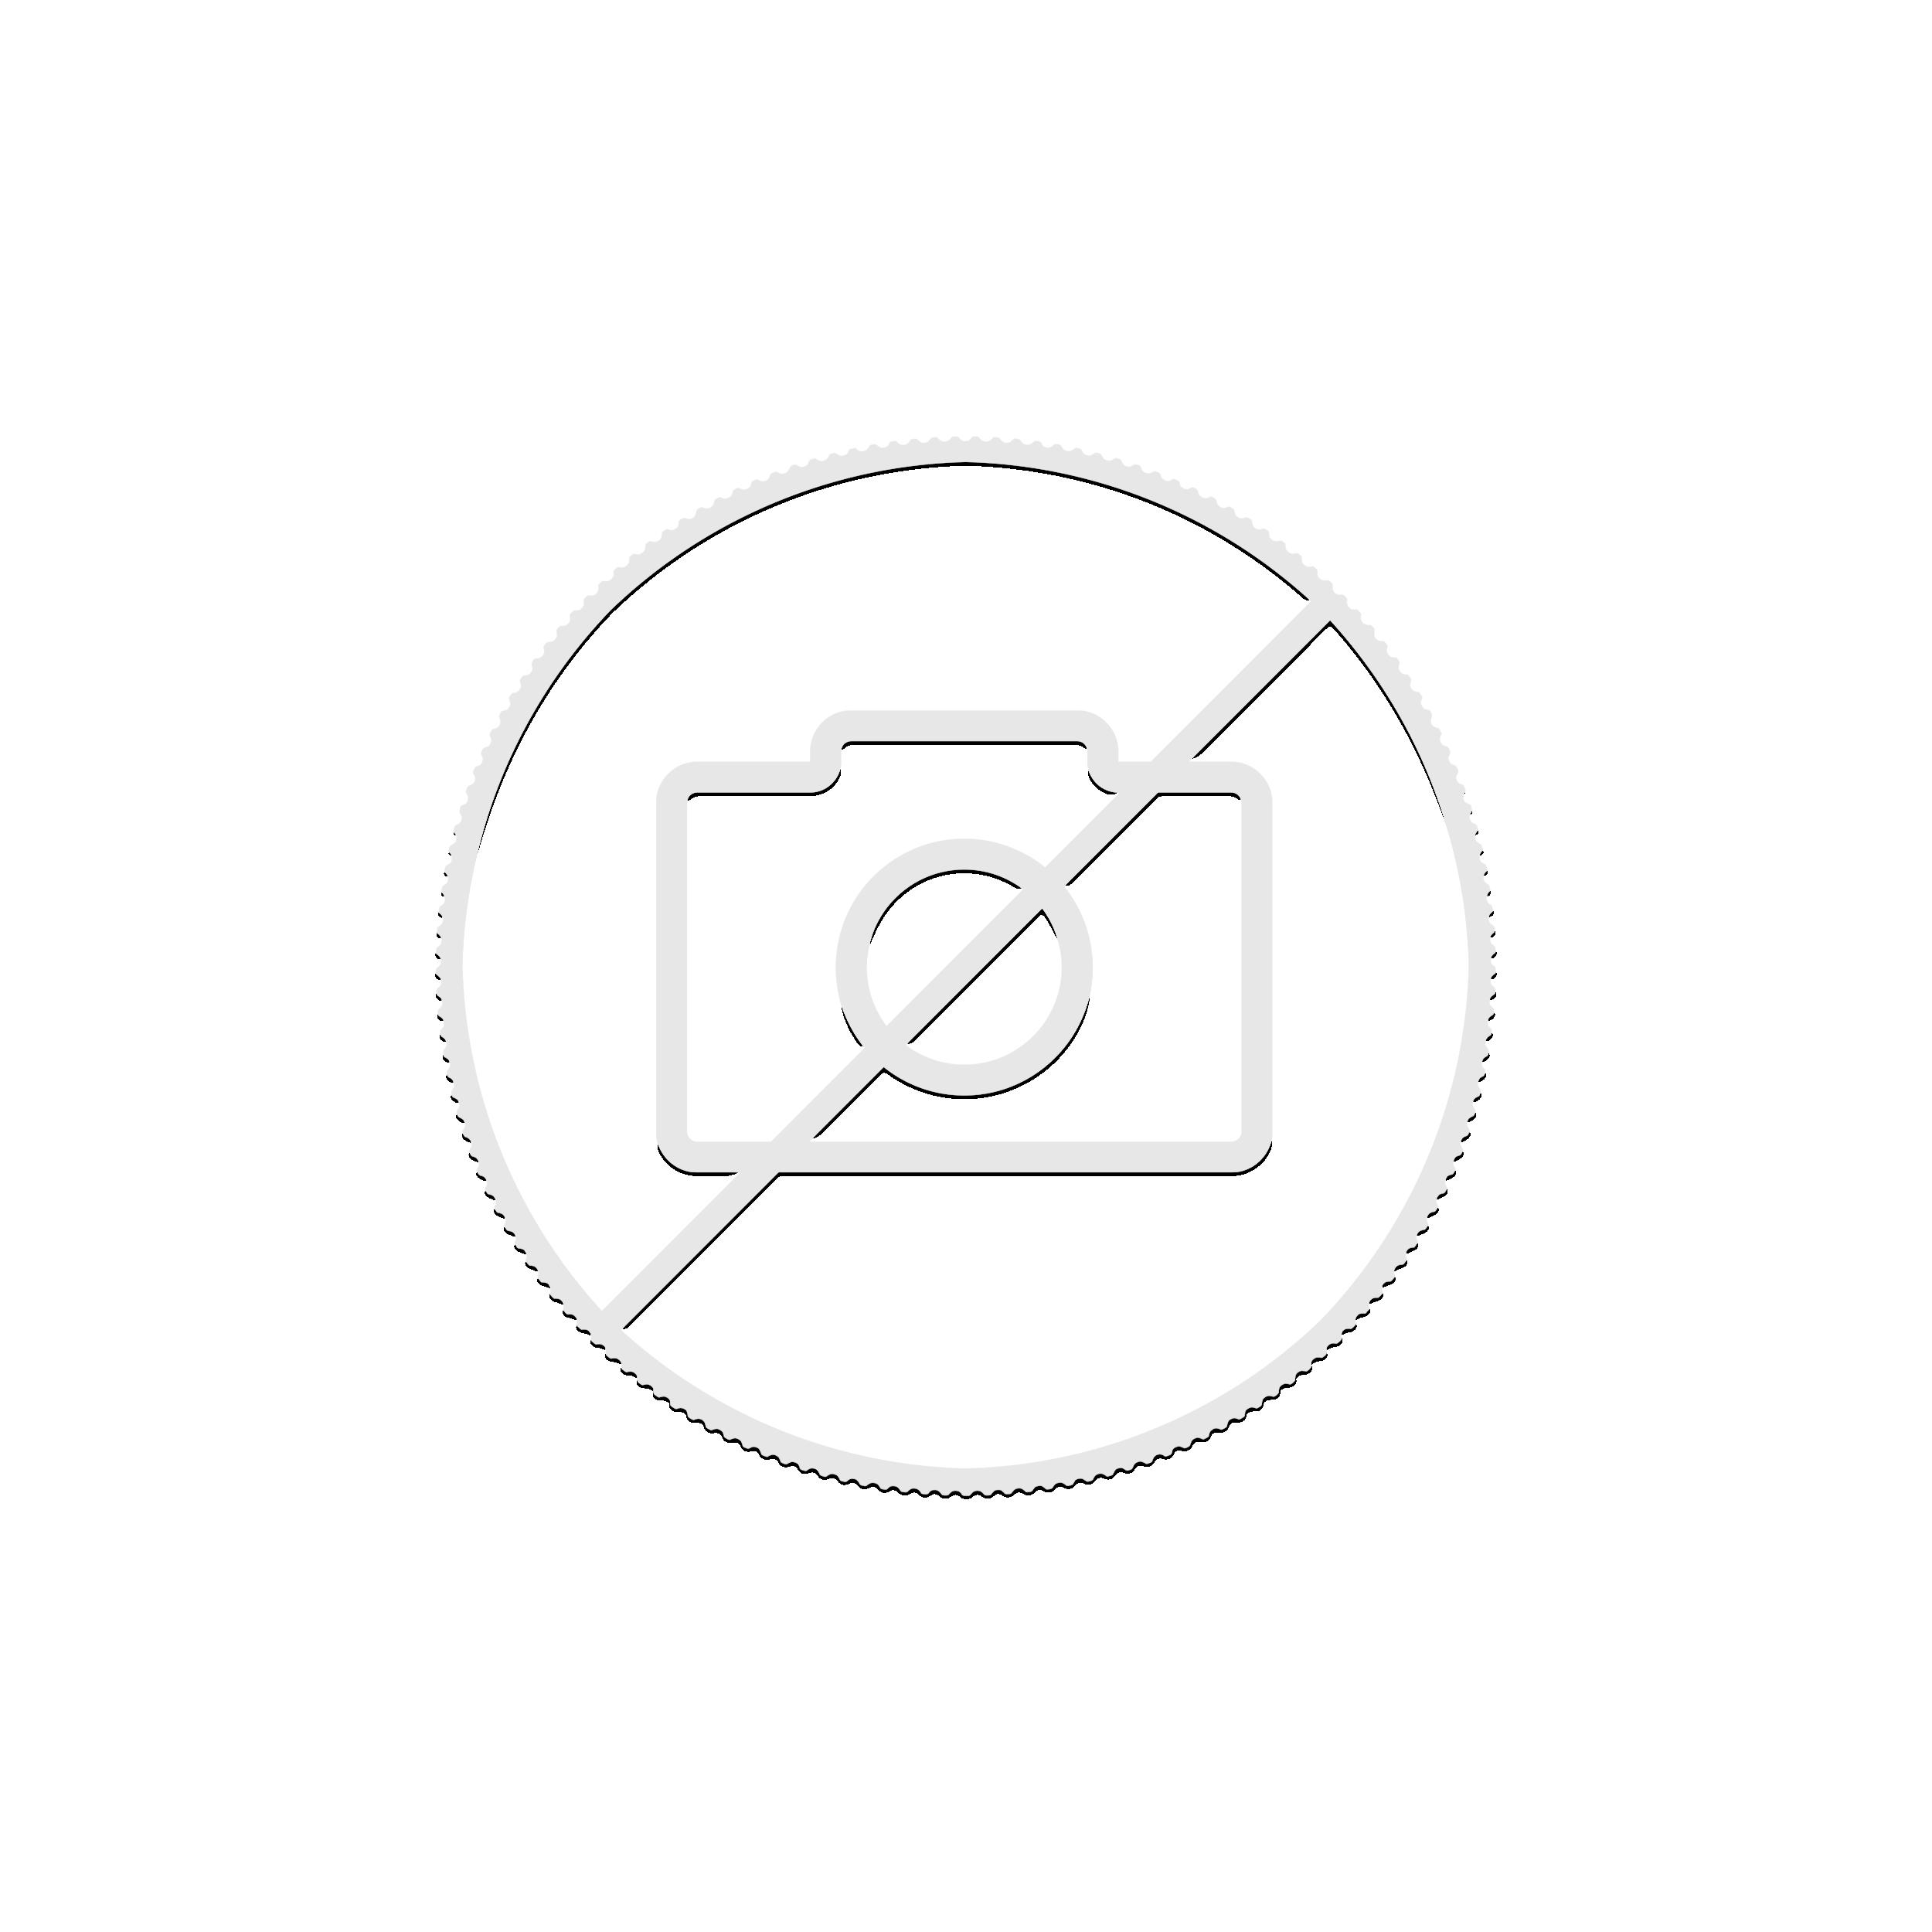 Silver coin Canadian Maple Leaf brooch legacy 2020